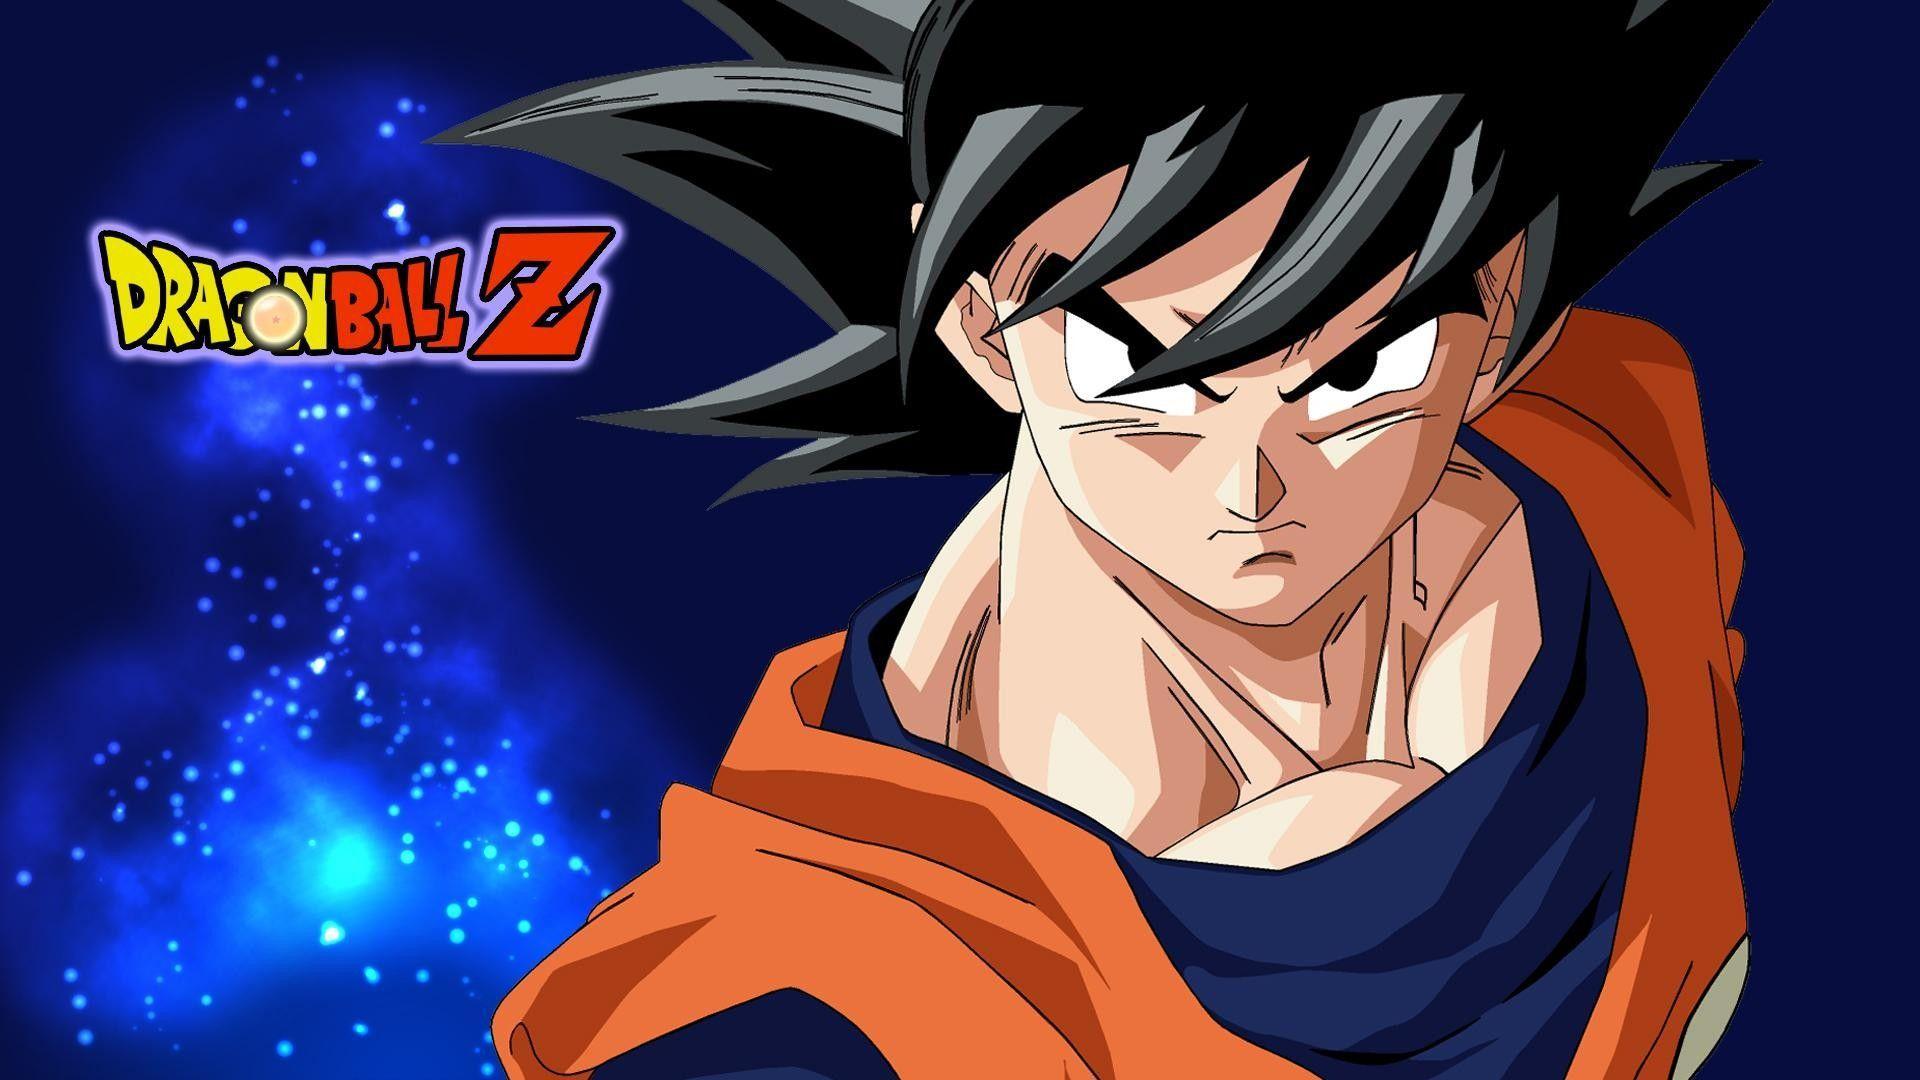 Dragon Ball Z Wallpapers HD Goku - Wallpaper Cave